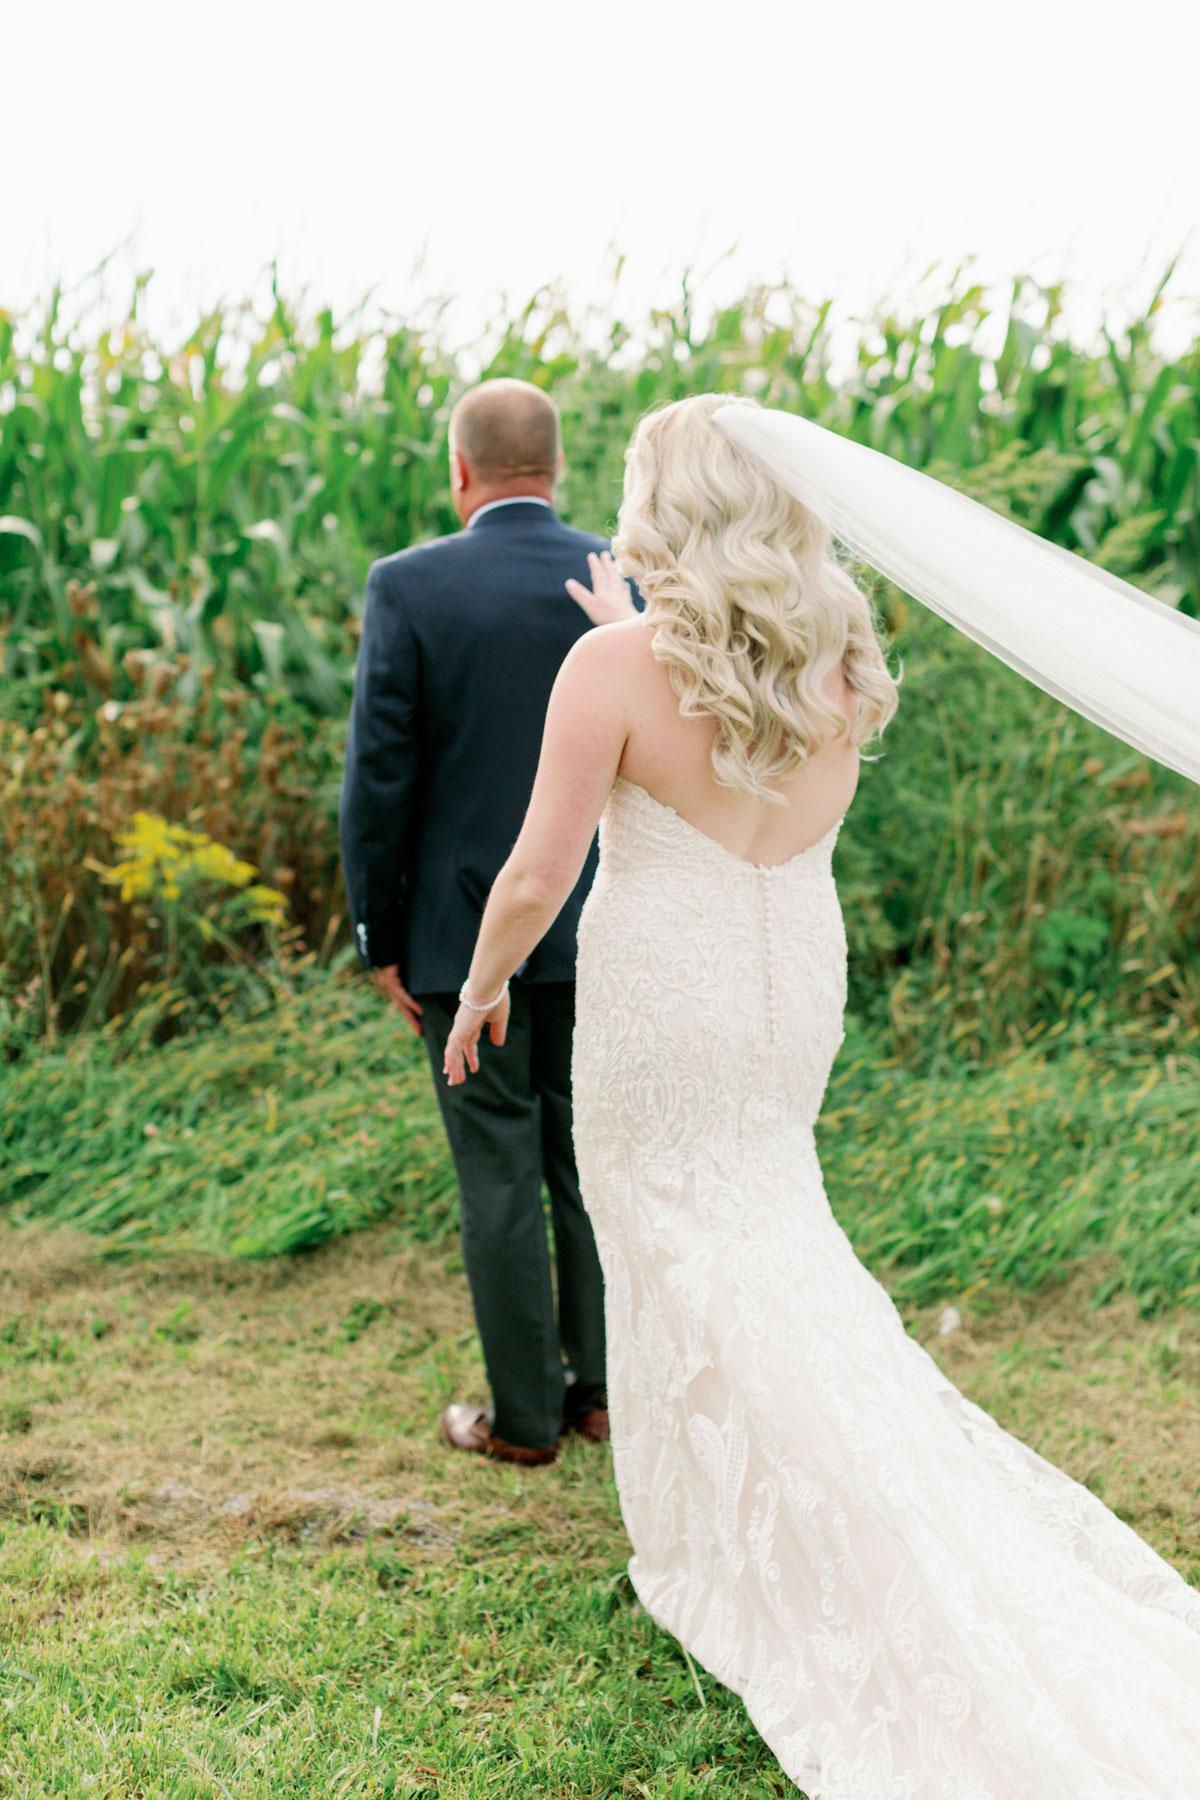 vineyard-bride-kayla-yestal-outdoor-summer-wedding-honsberger-estate-winery-niagara-toronto-vendor-0016.jpg